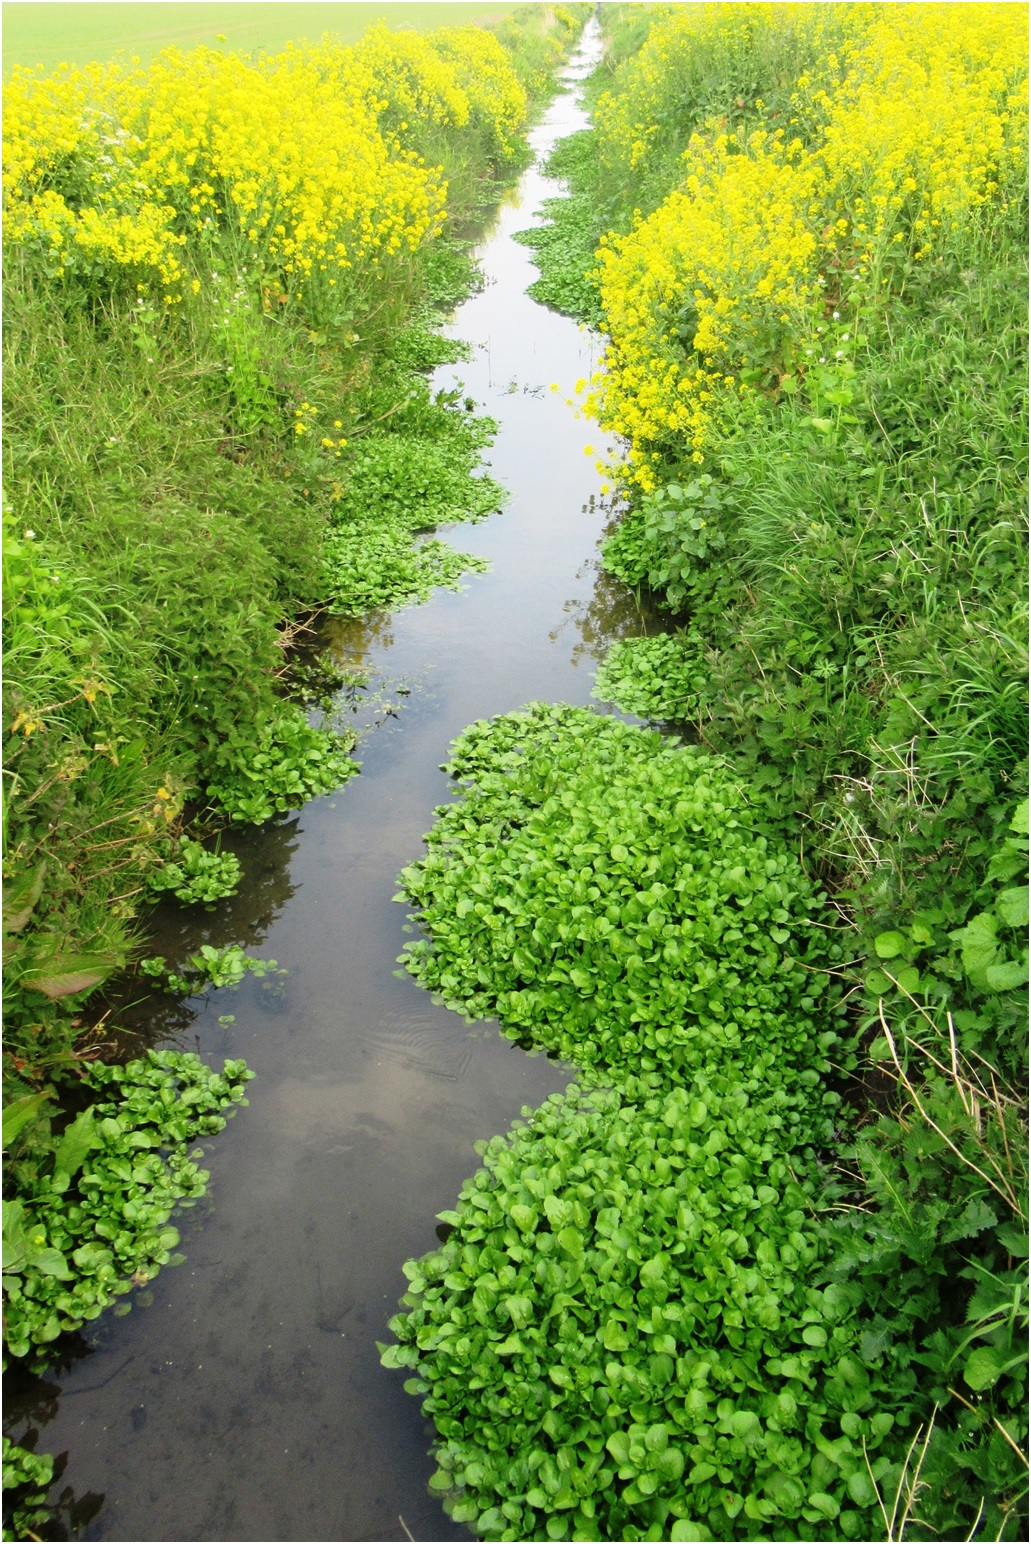 Water Cress in Dyke